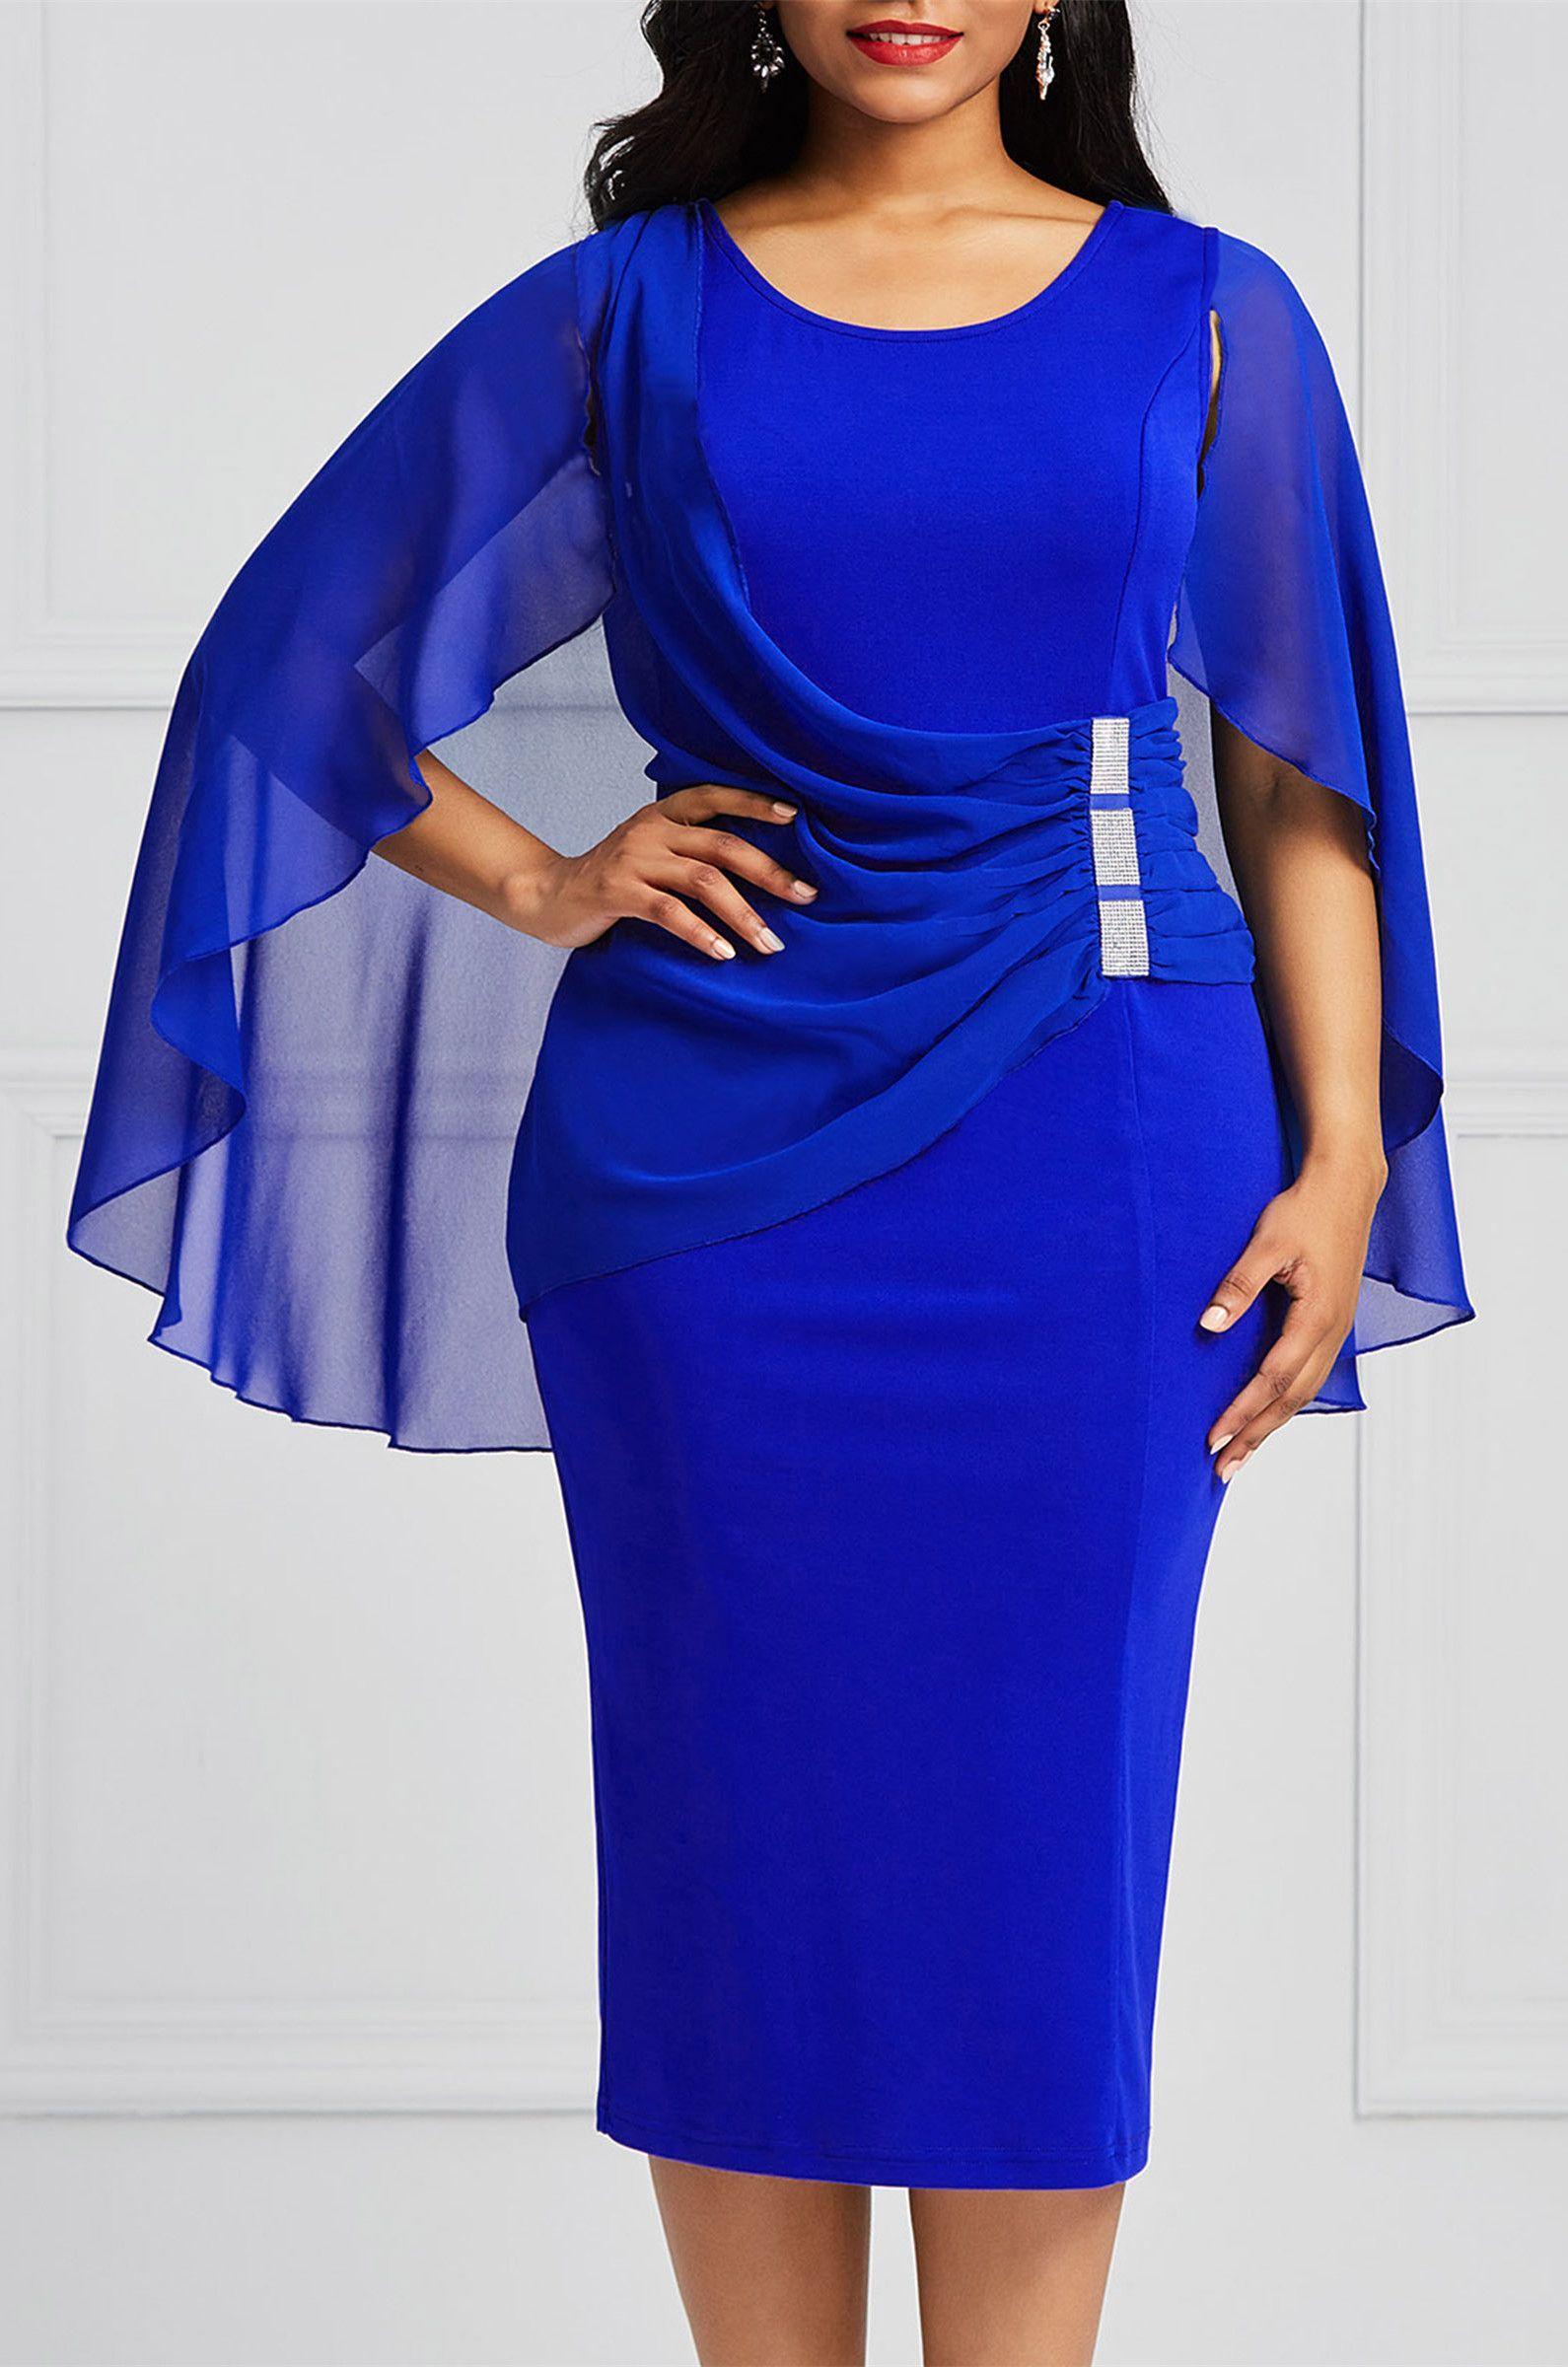 Bodycon midcalf batwing sleeve womenus dress in пышечки